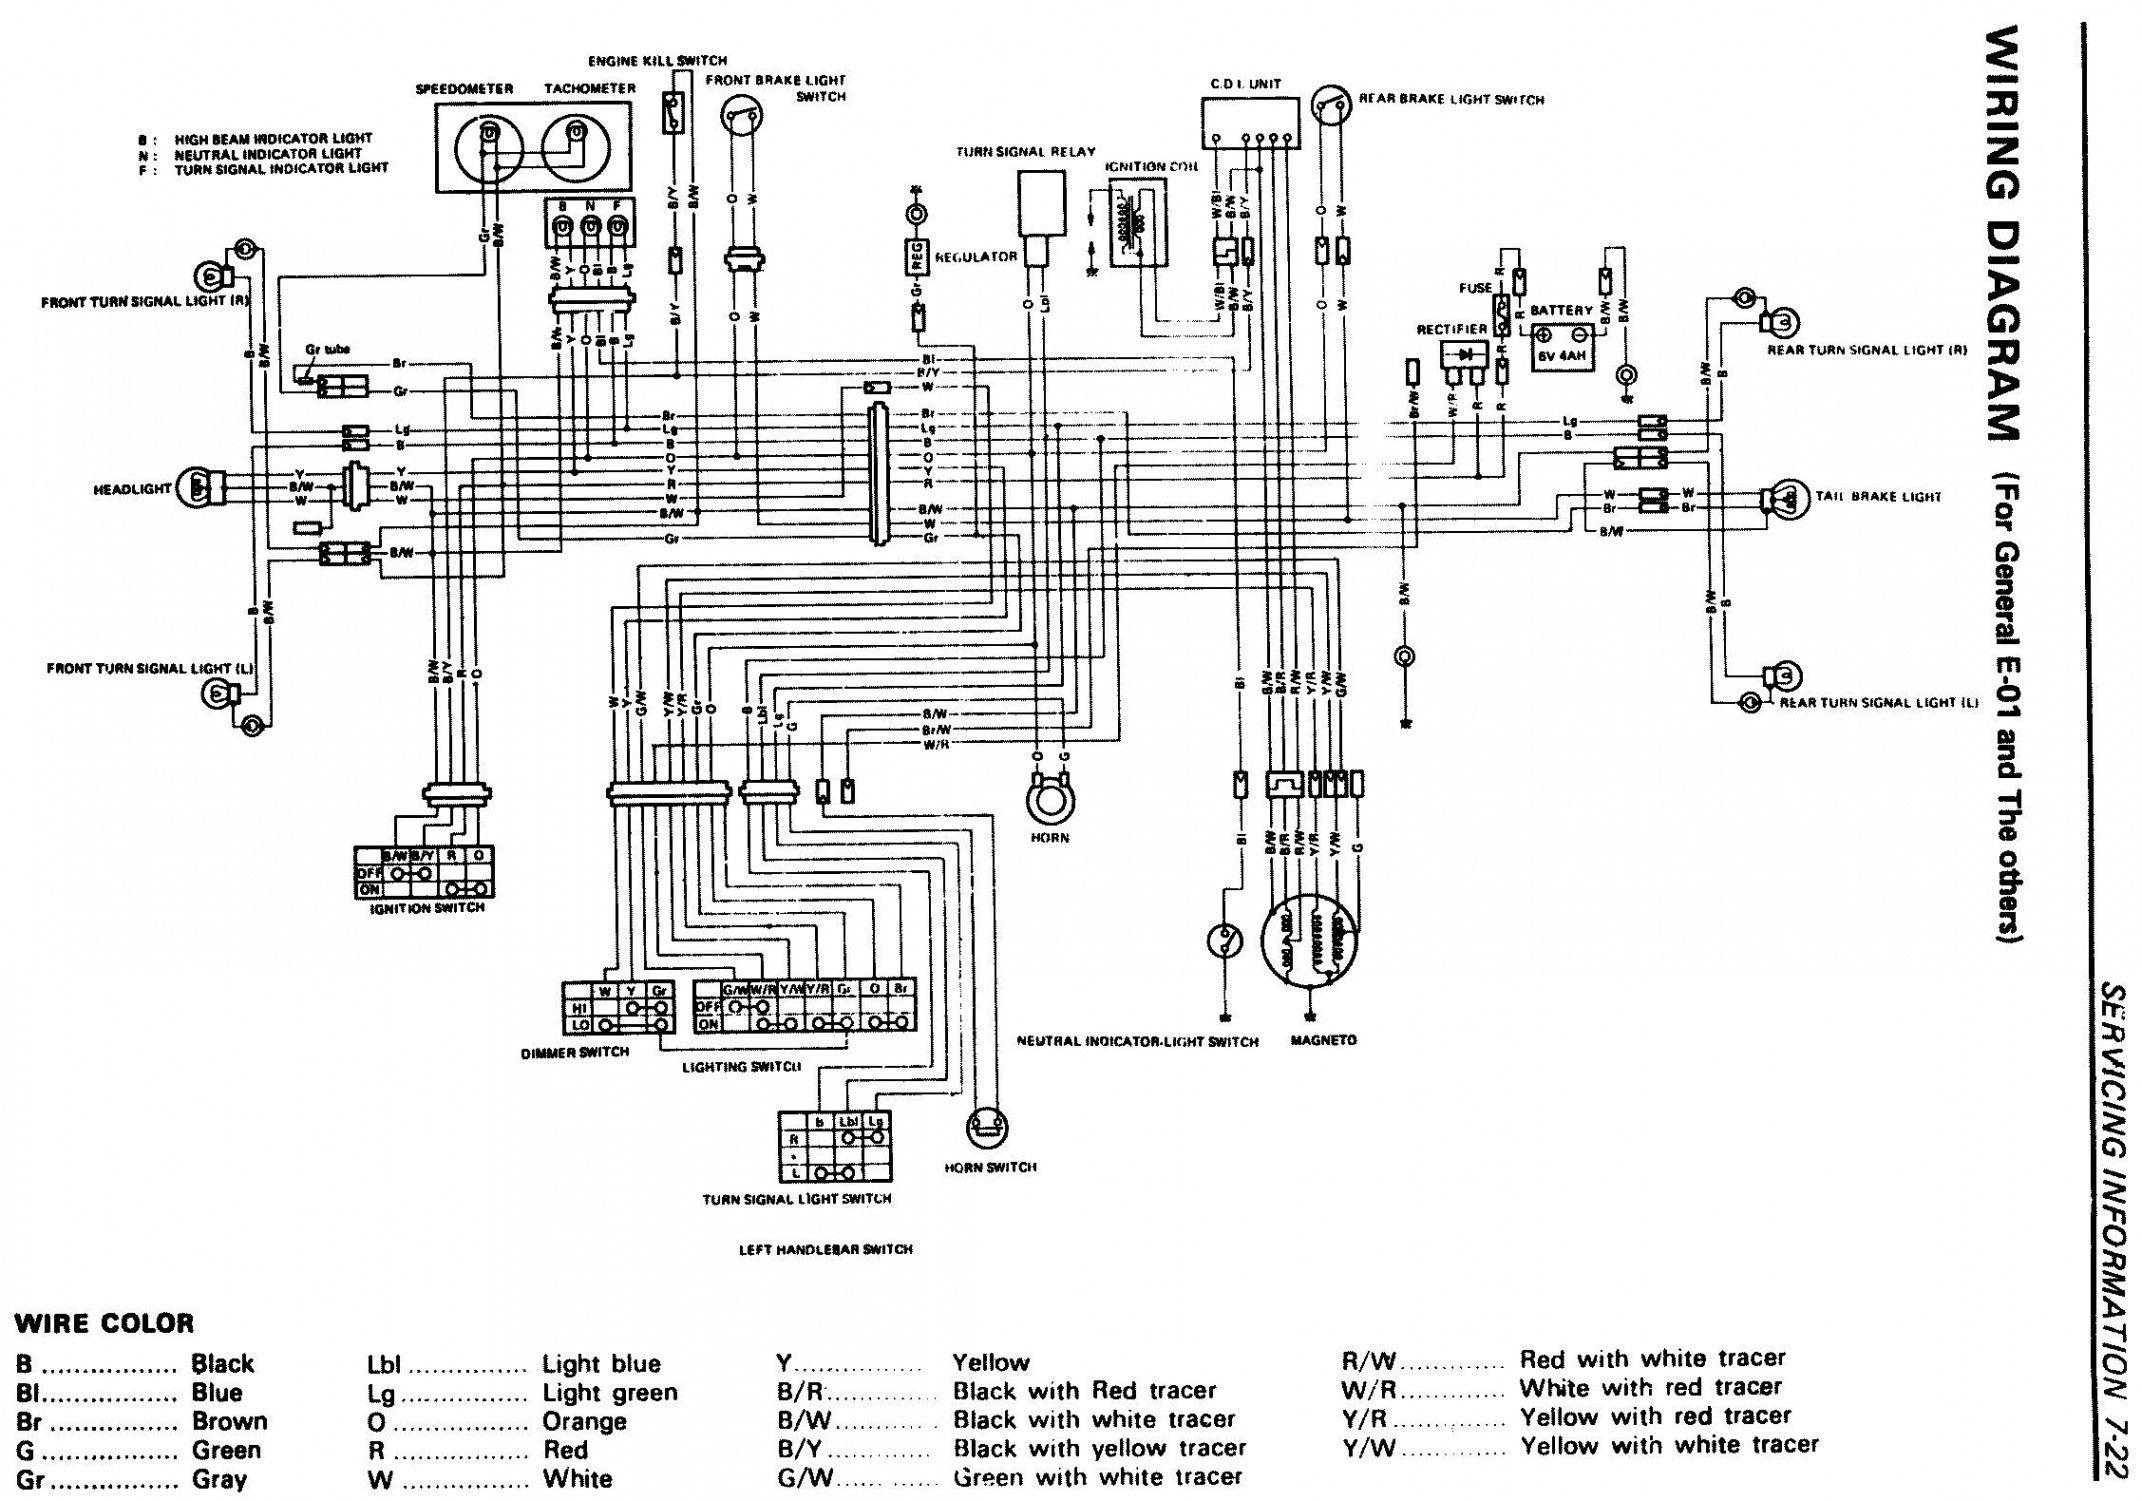 Unique Wiring Diagram 1990 Club Car Golf Cart Diagram Diagramtemplate Diagramsample